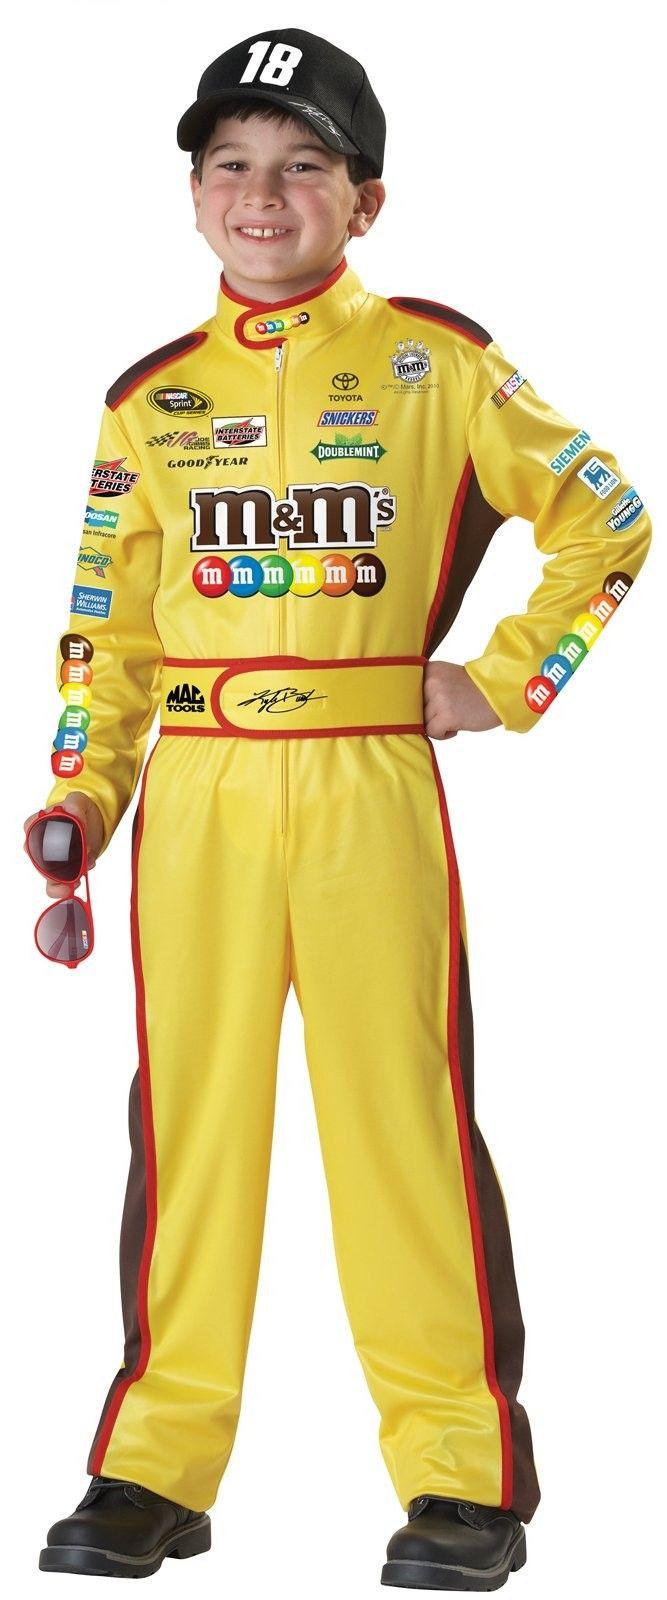 NASCAR Kyle Busch Child Costume - The Nascar Kyle Busch Child Costume includes a jumpsuit, cap ...